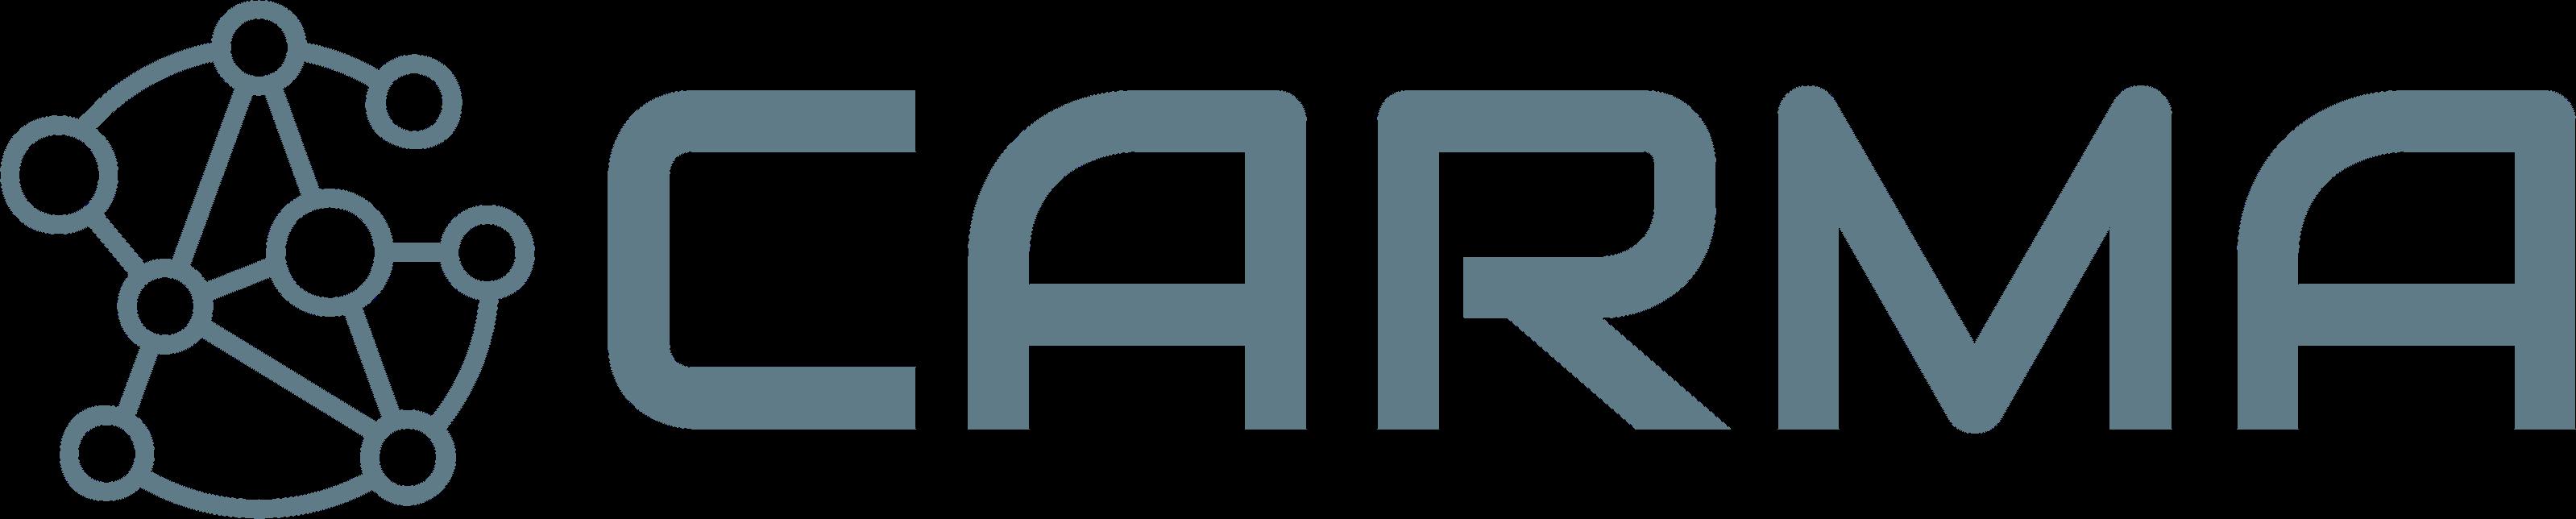 CARMA logo no tagline (trans)